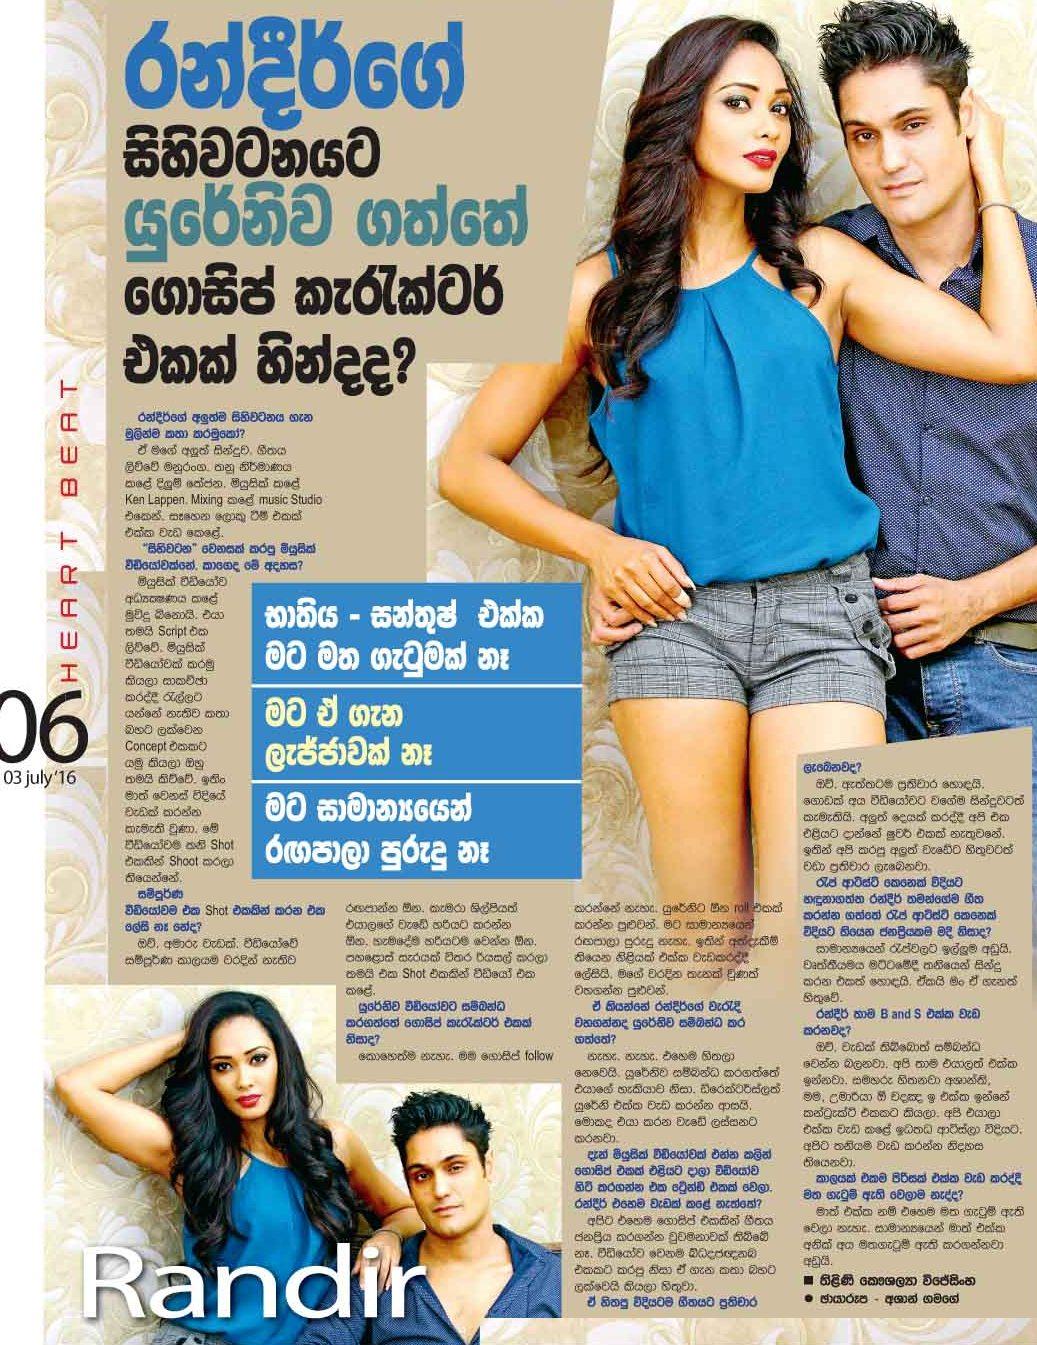 Sinhala Litha 2018 >> යුරේනිව ගත්තේ ඇයි - Randhir Vithana new music Video | Sri Lanka Newspaper Articles